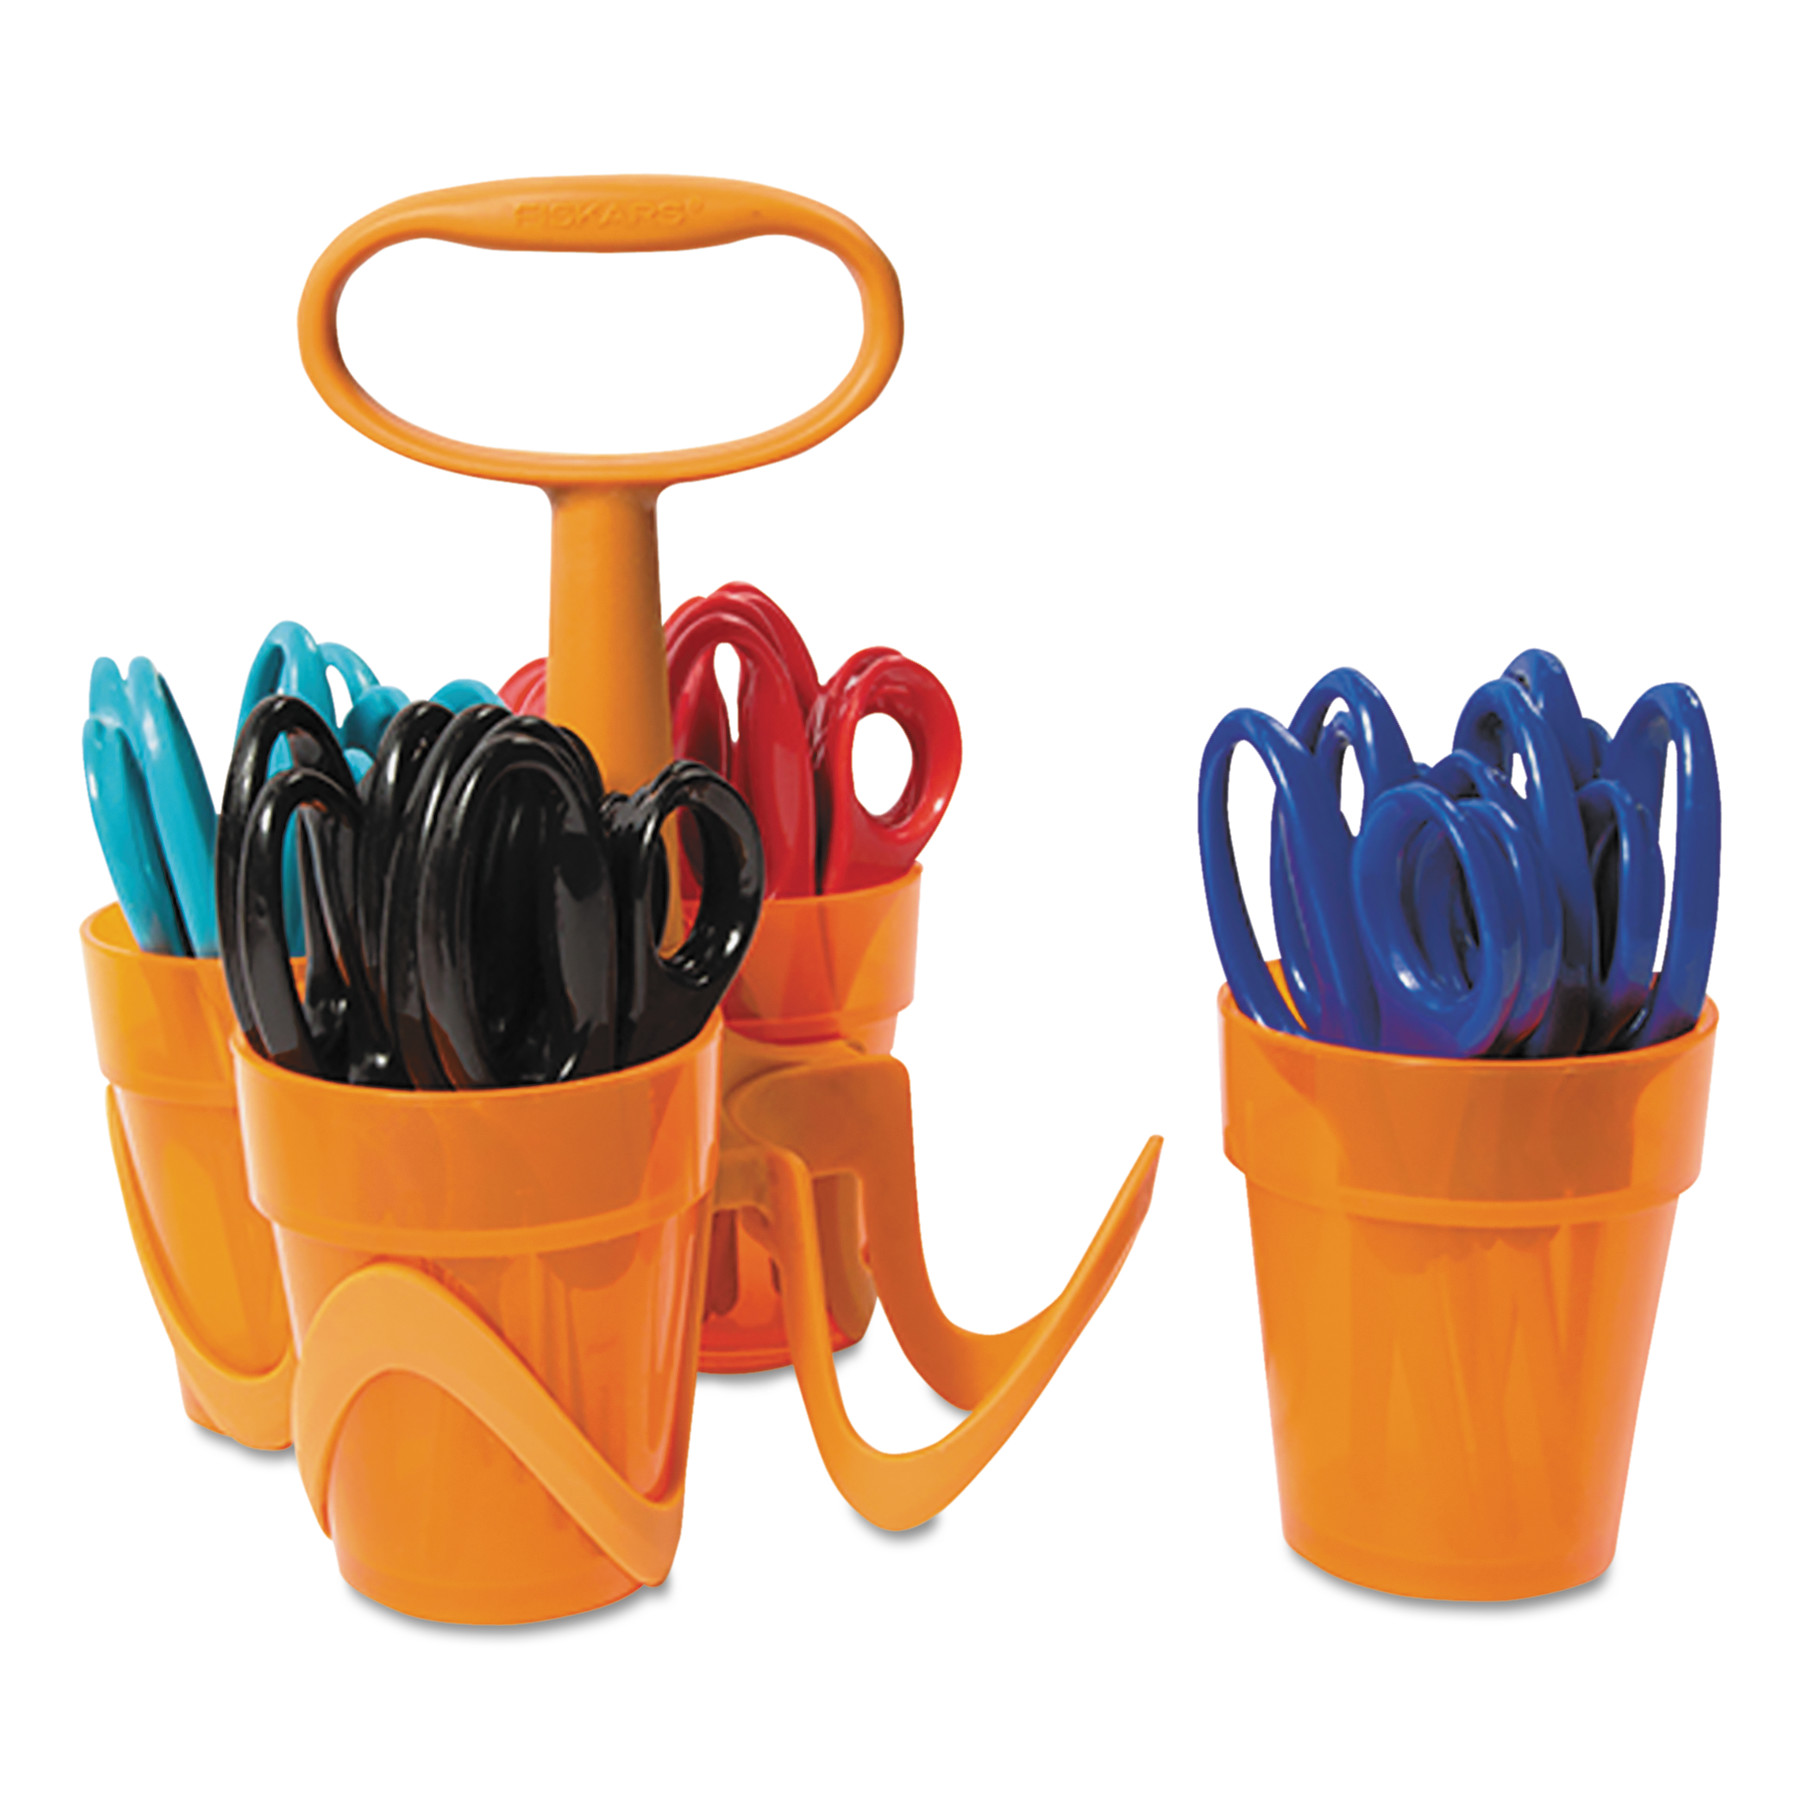 "Fiskars Premium 5"" Pointed Kids Scissors Classpack with Caddy, 24-Count"